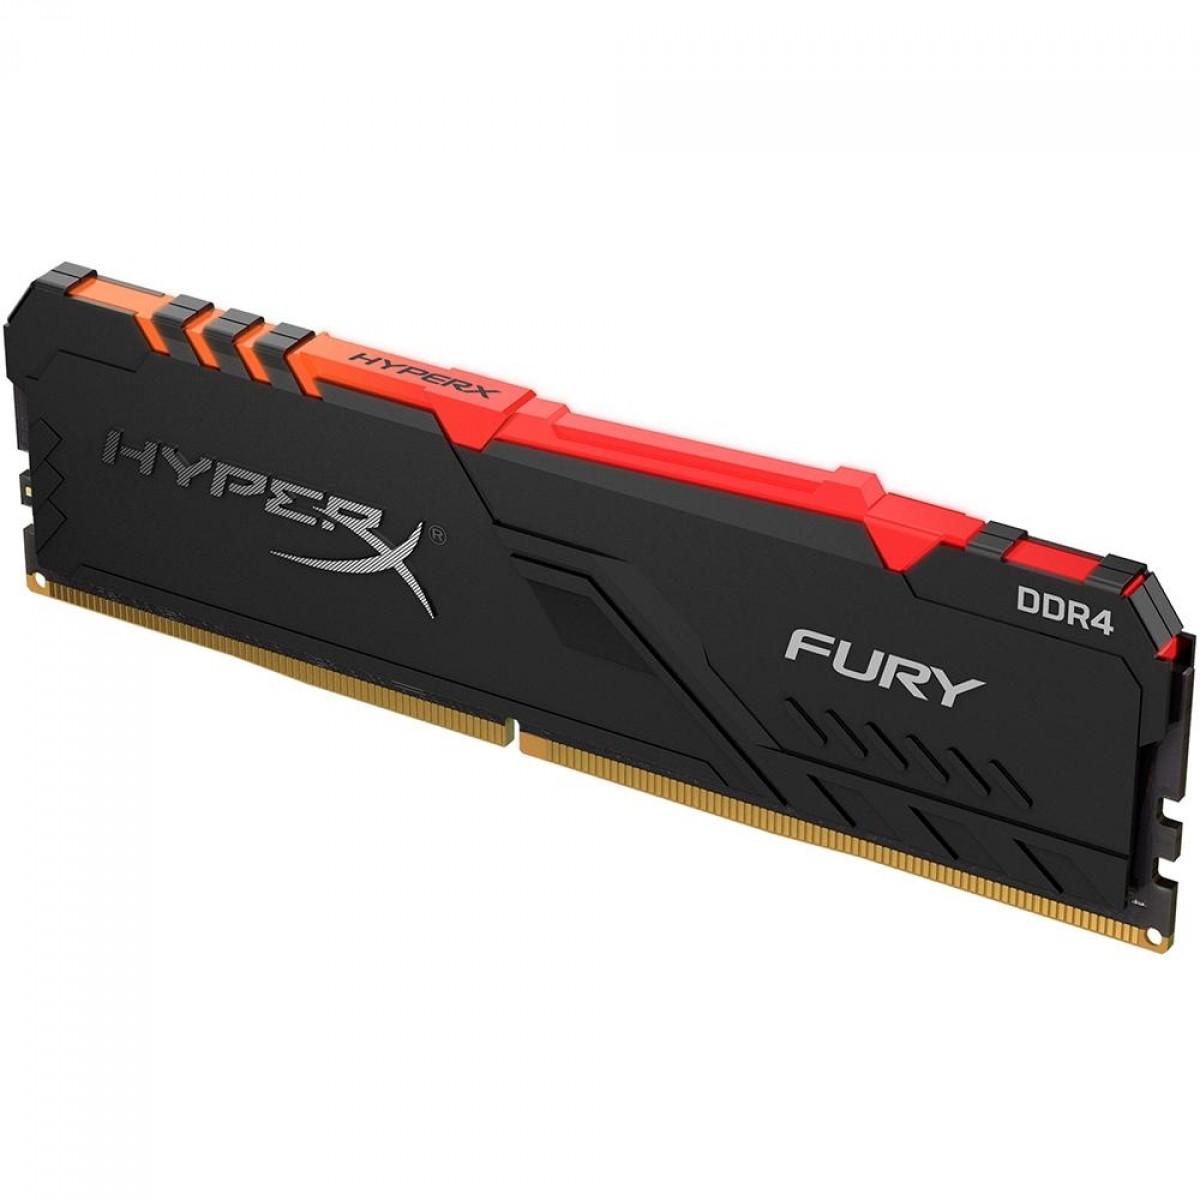 Memória DDR4 Kingston HyperX Fury RGB, 16GB, 2400MHz, Black, HX424C15FB3A/16